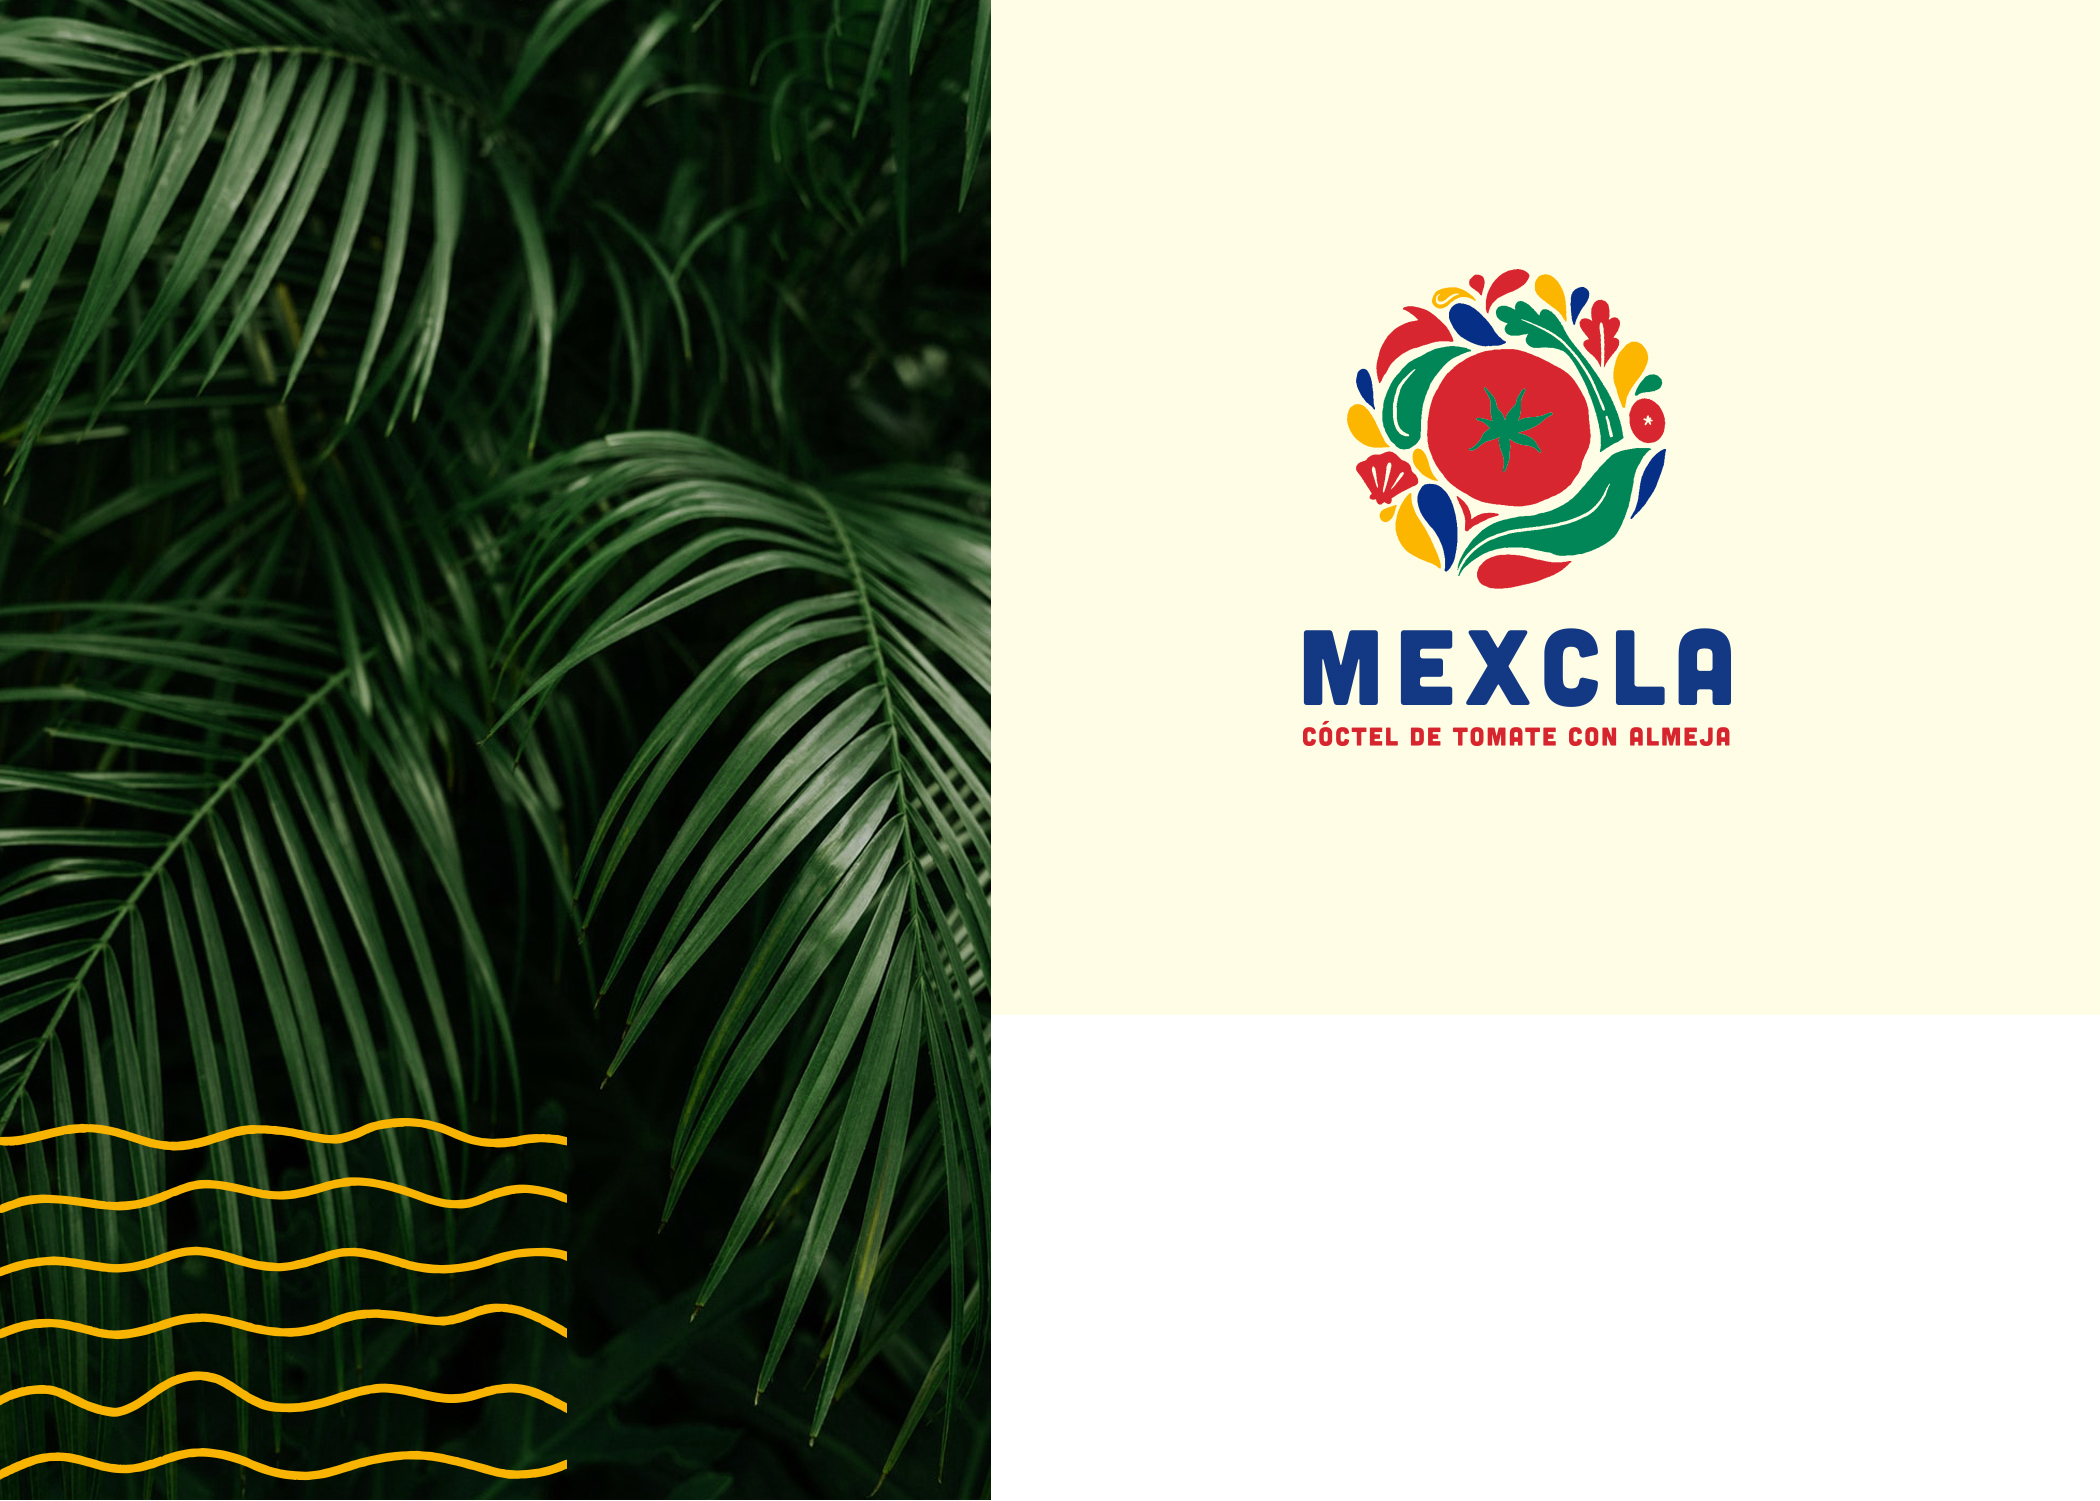 Mexcla Branding